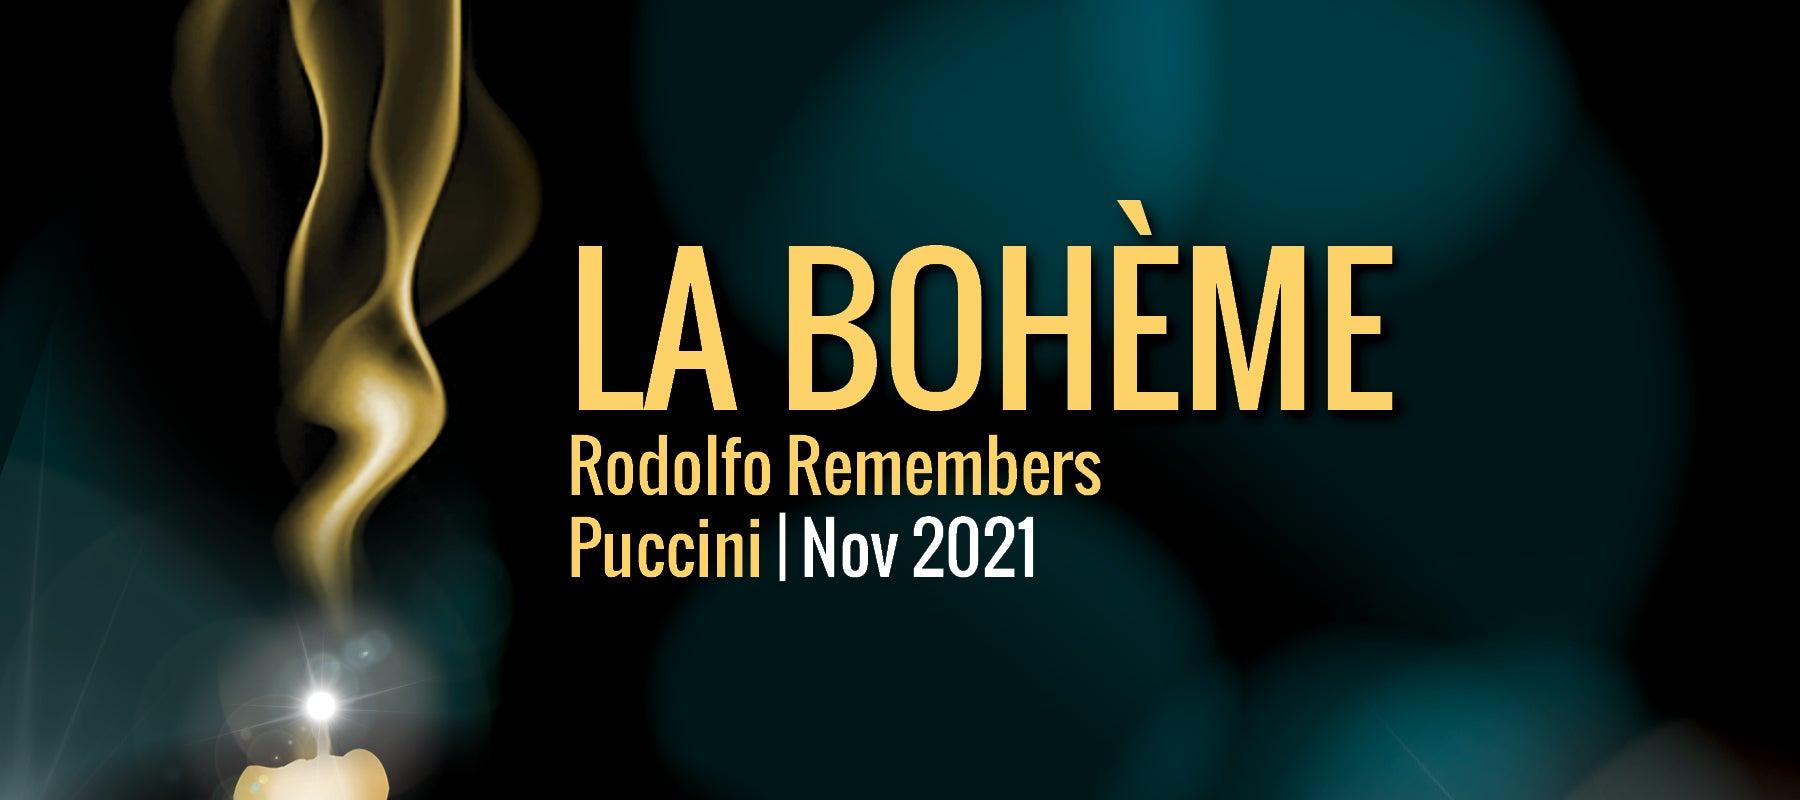 Virginia Opera presents La Bohème: Rodolfo Remembers